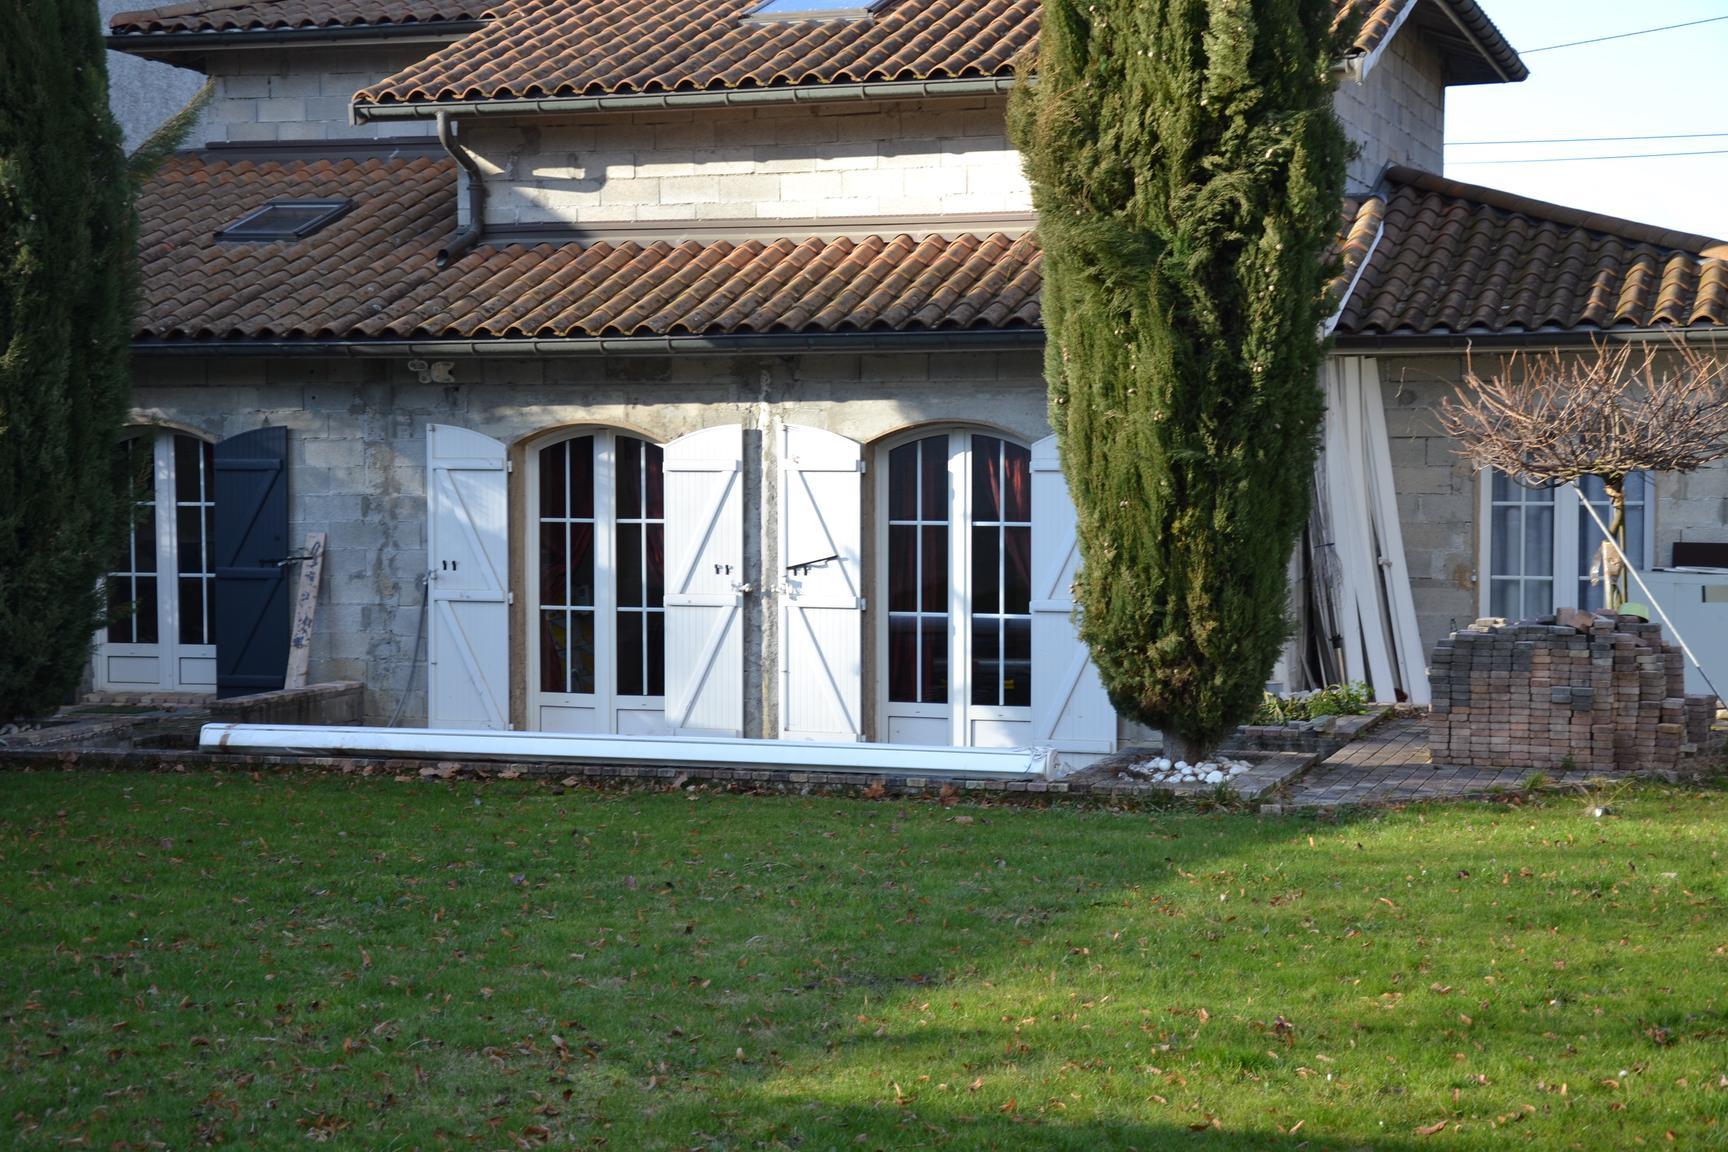 Annonce vente maison meyzieu 69330 160 m 398 000 for Maison a meyzieu